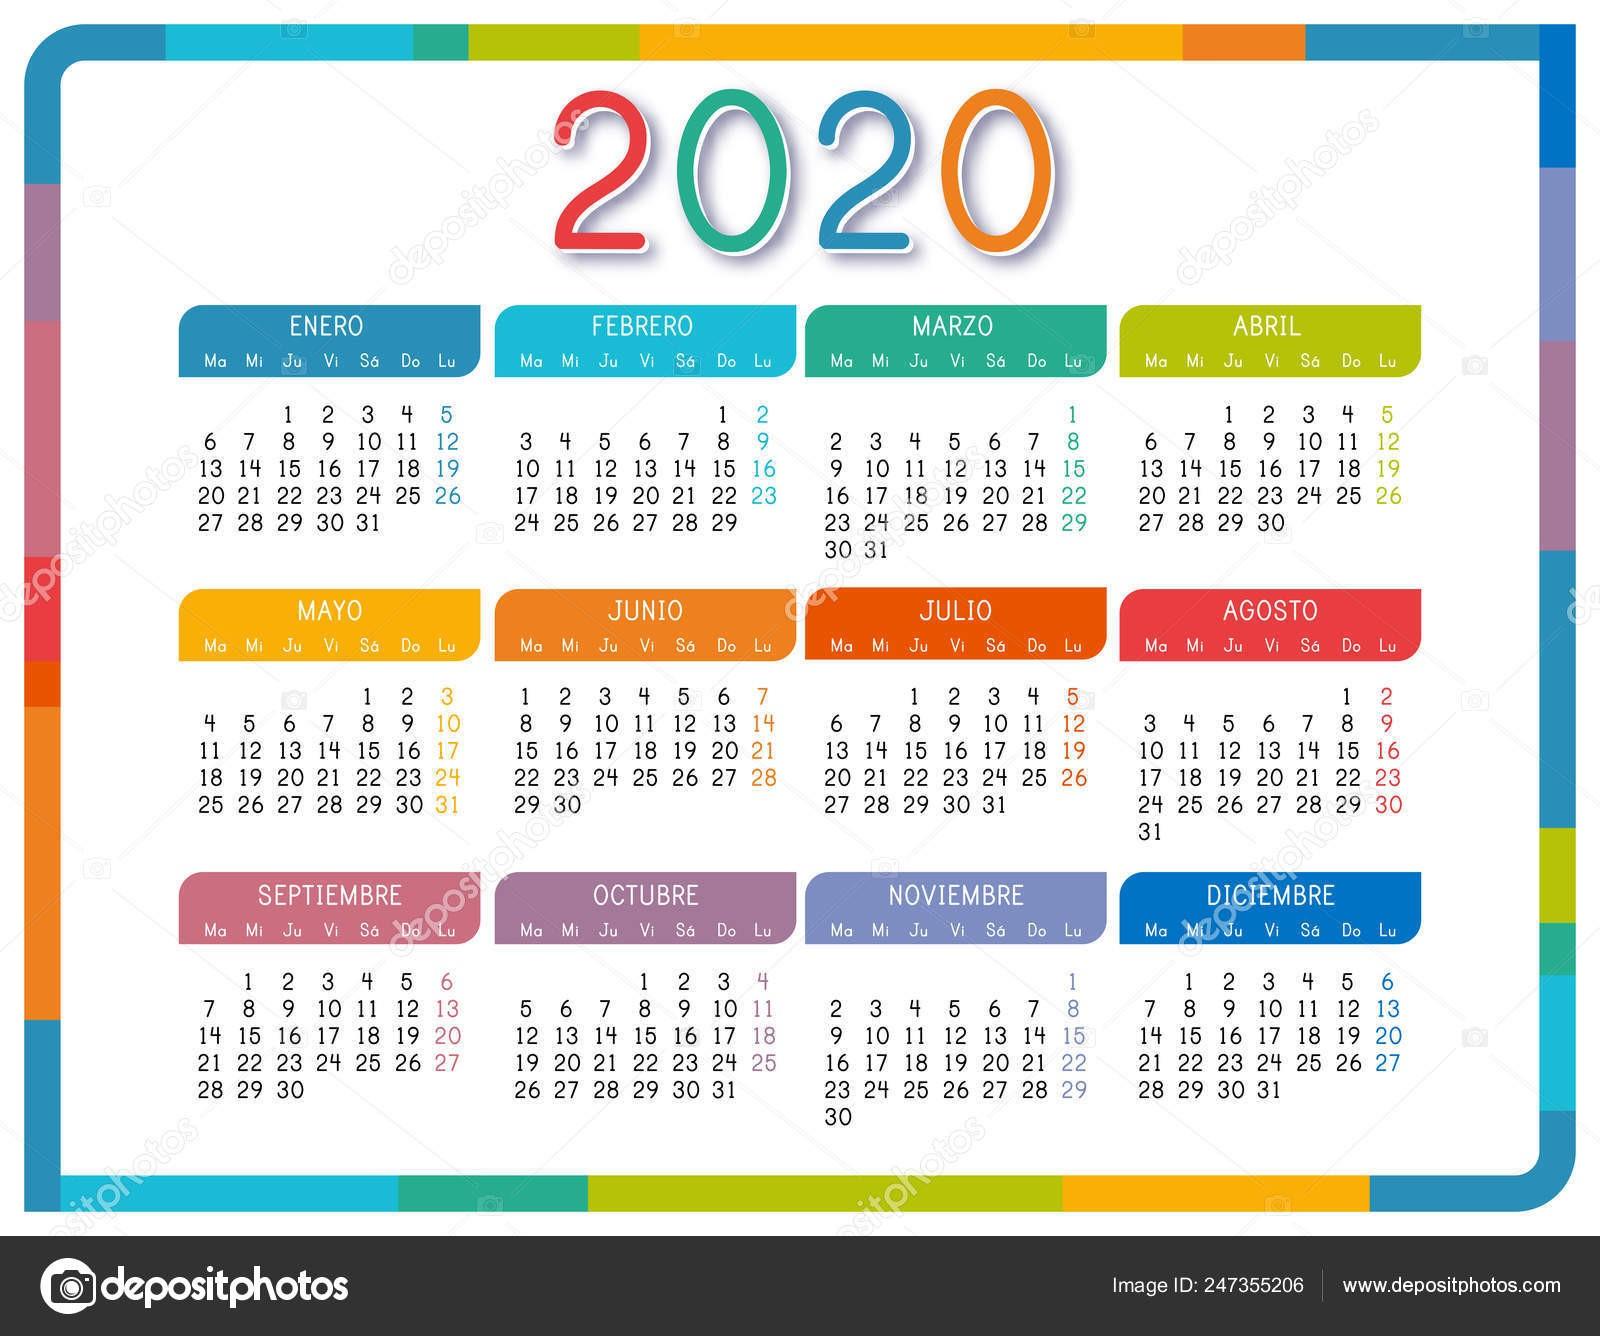 stock illustration calendar 2020 spanish language white